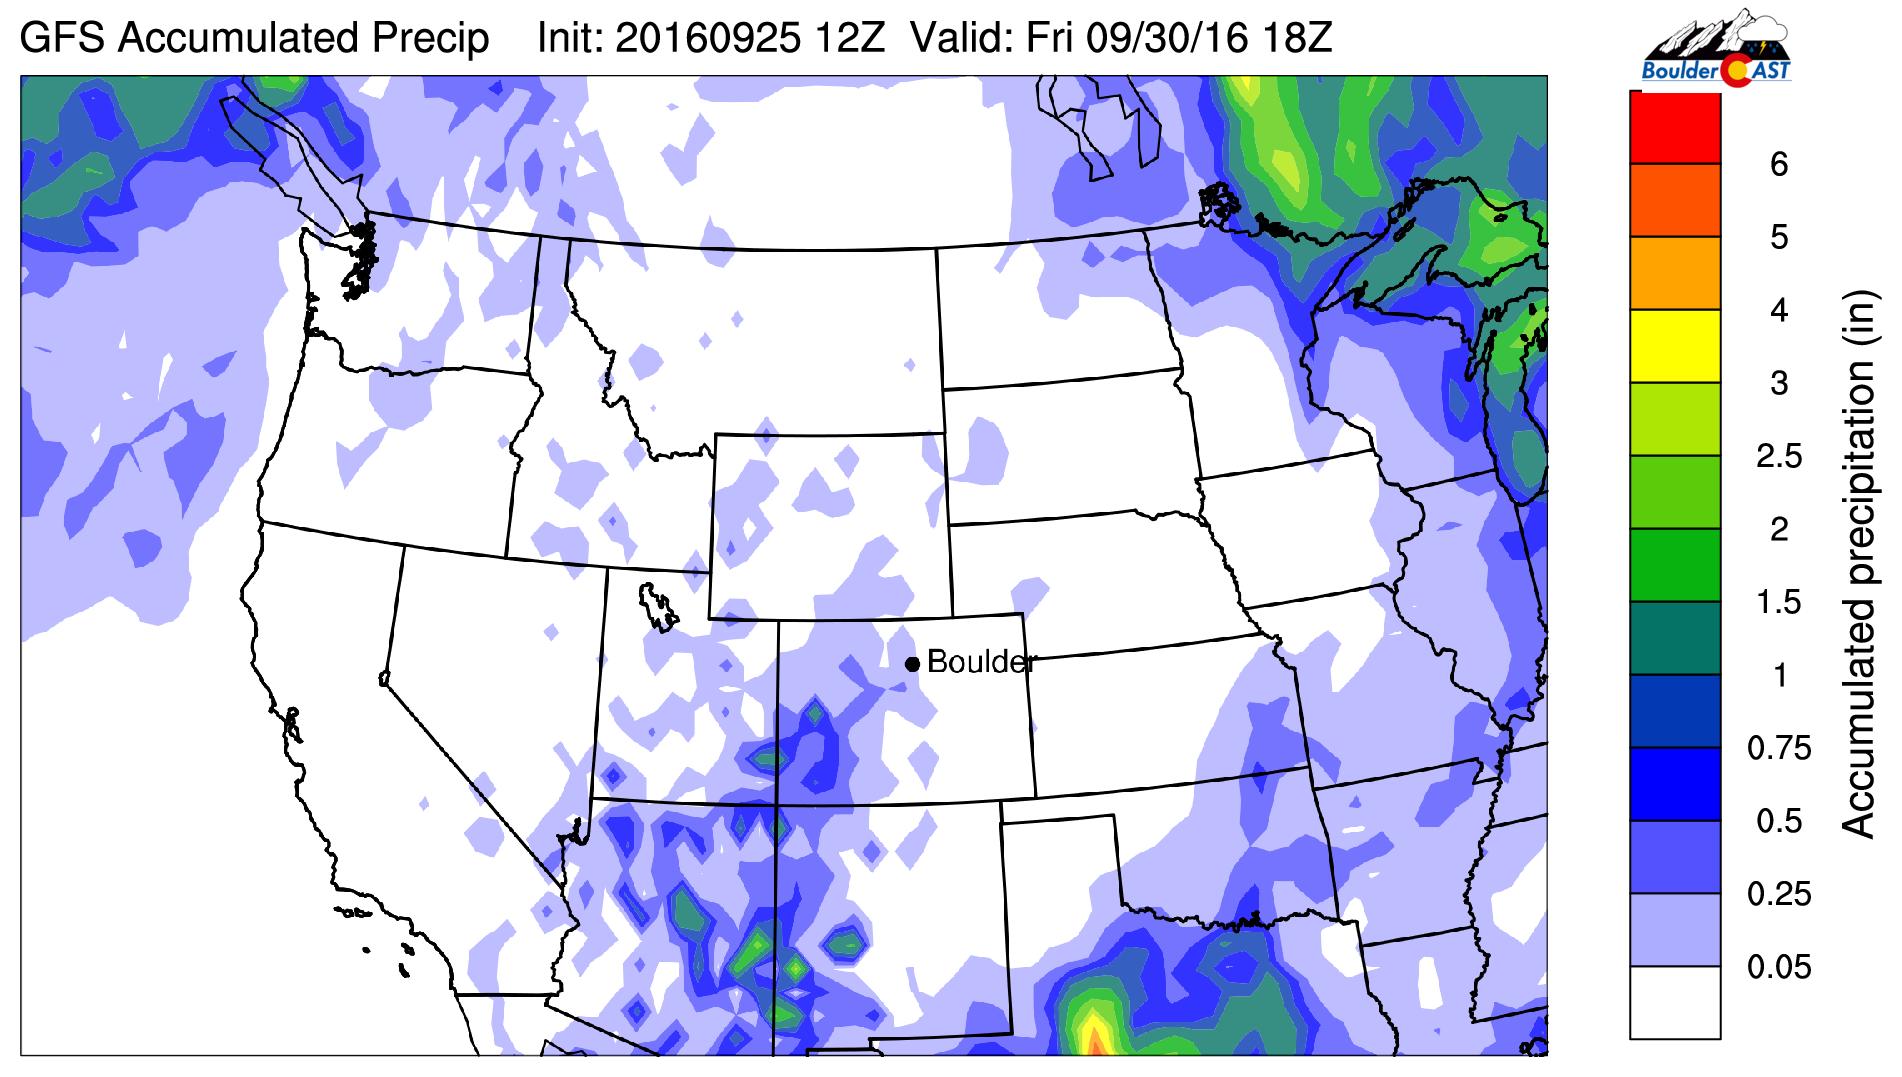 GFS accumulated precipitation through Friday